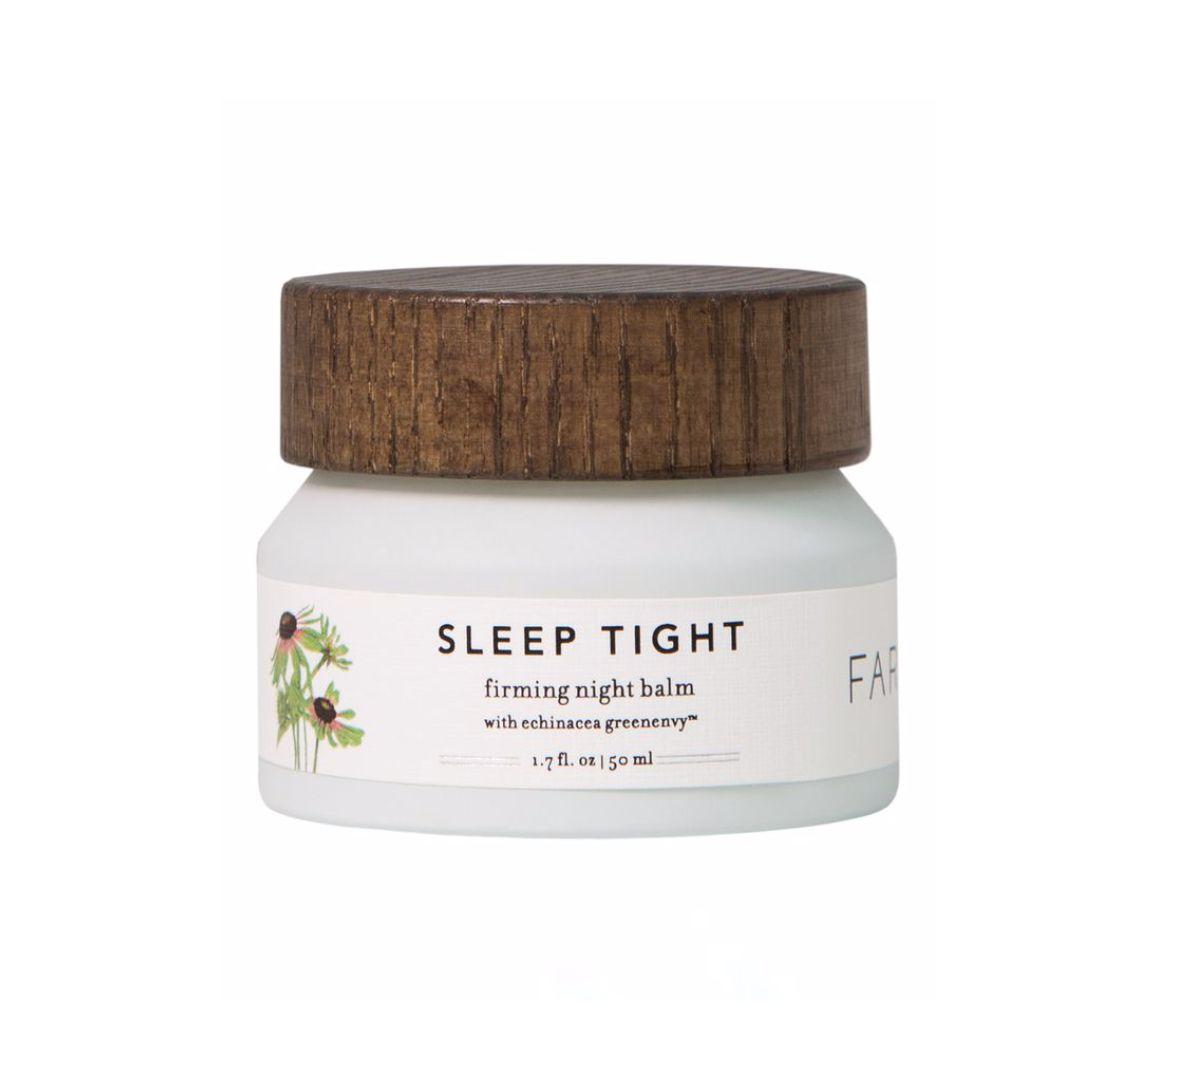 Sleep Tight Firming Night Balm with Echinacea GreenEnvy™